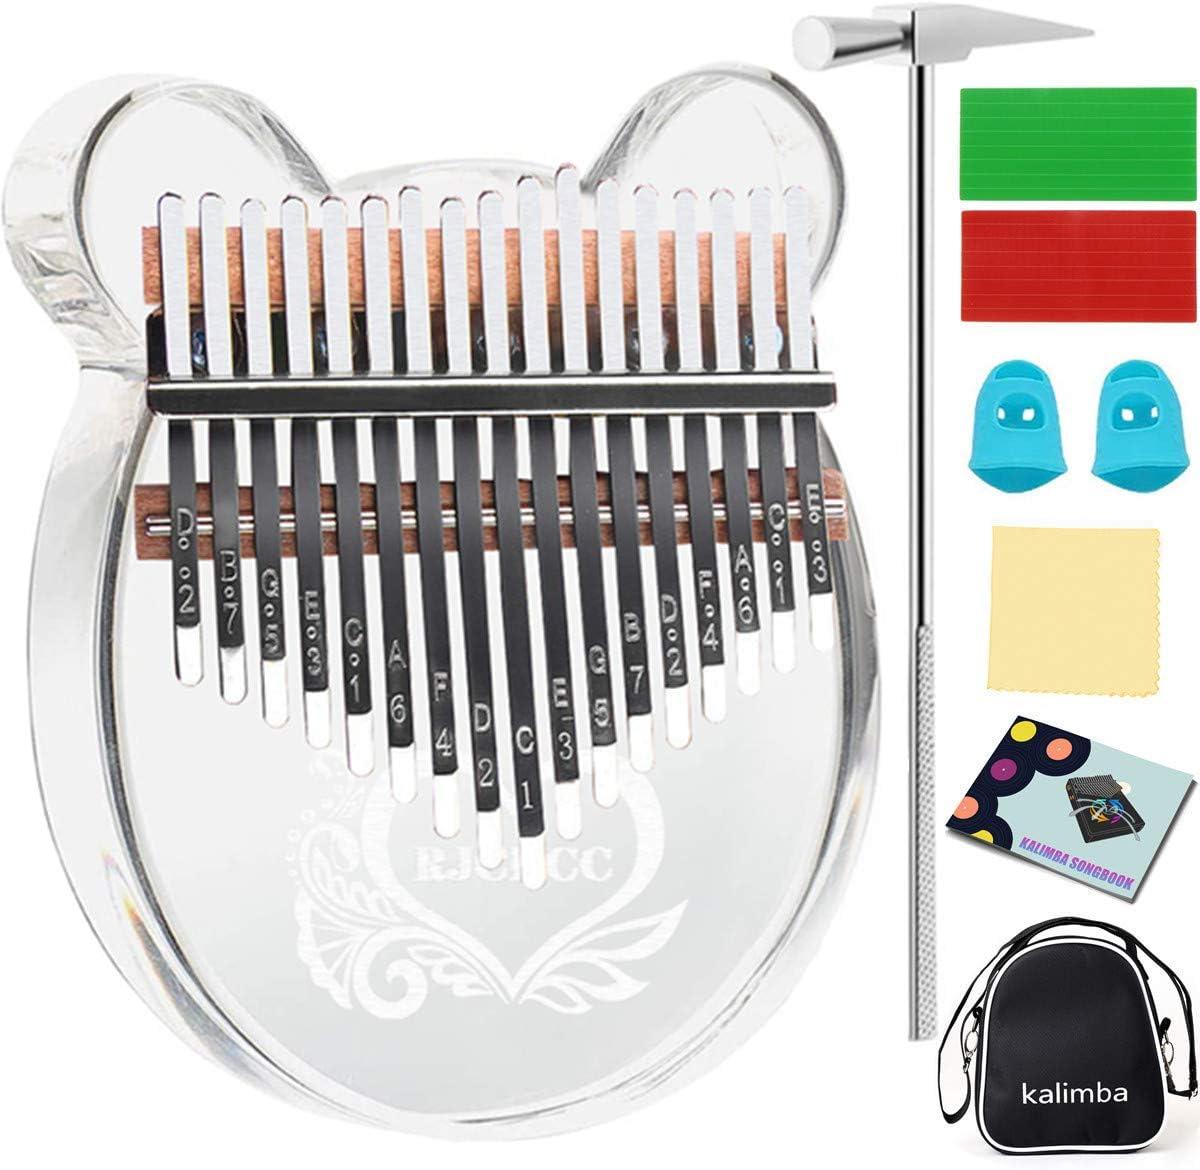 Kalimba 17 Keys Kalimba Transparent Thumb Piano Home Percussion Instrument Acrylic Crystal Kalimba Finger Piano On for Beginner Color : Pink, Size : 17 Keys